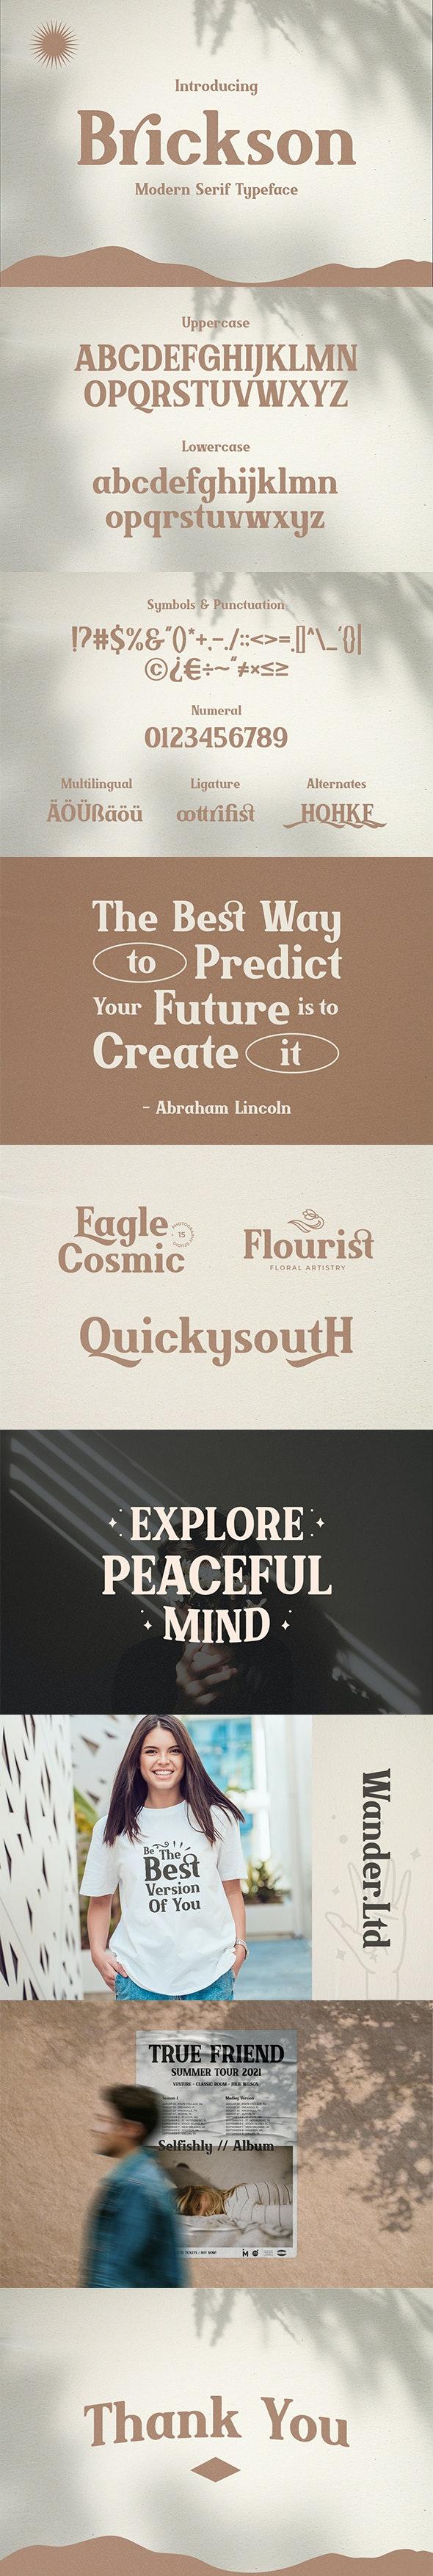 Brickson - Elegant Modern Serif - Serif Fonts